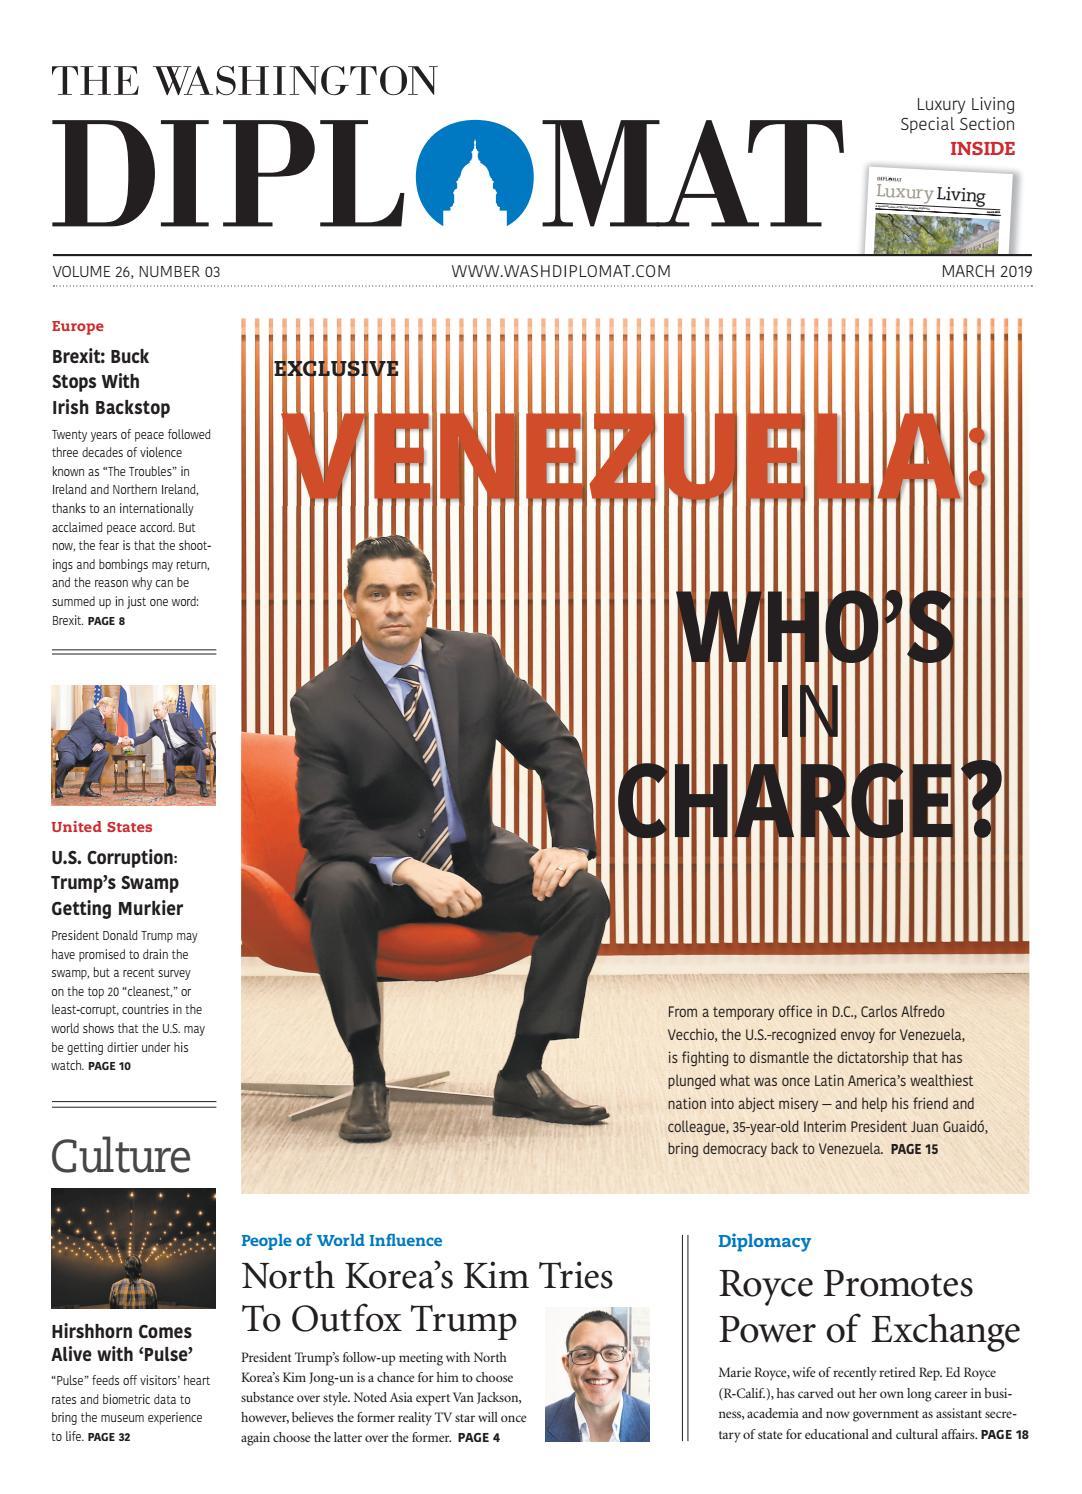 ba5ea05038fa The Washington Diplomat - March 2019 by The Washington Diplomat - issuu